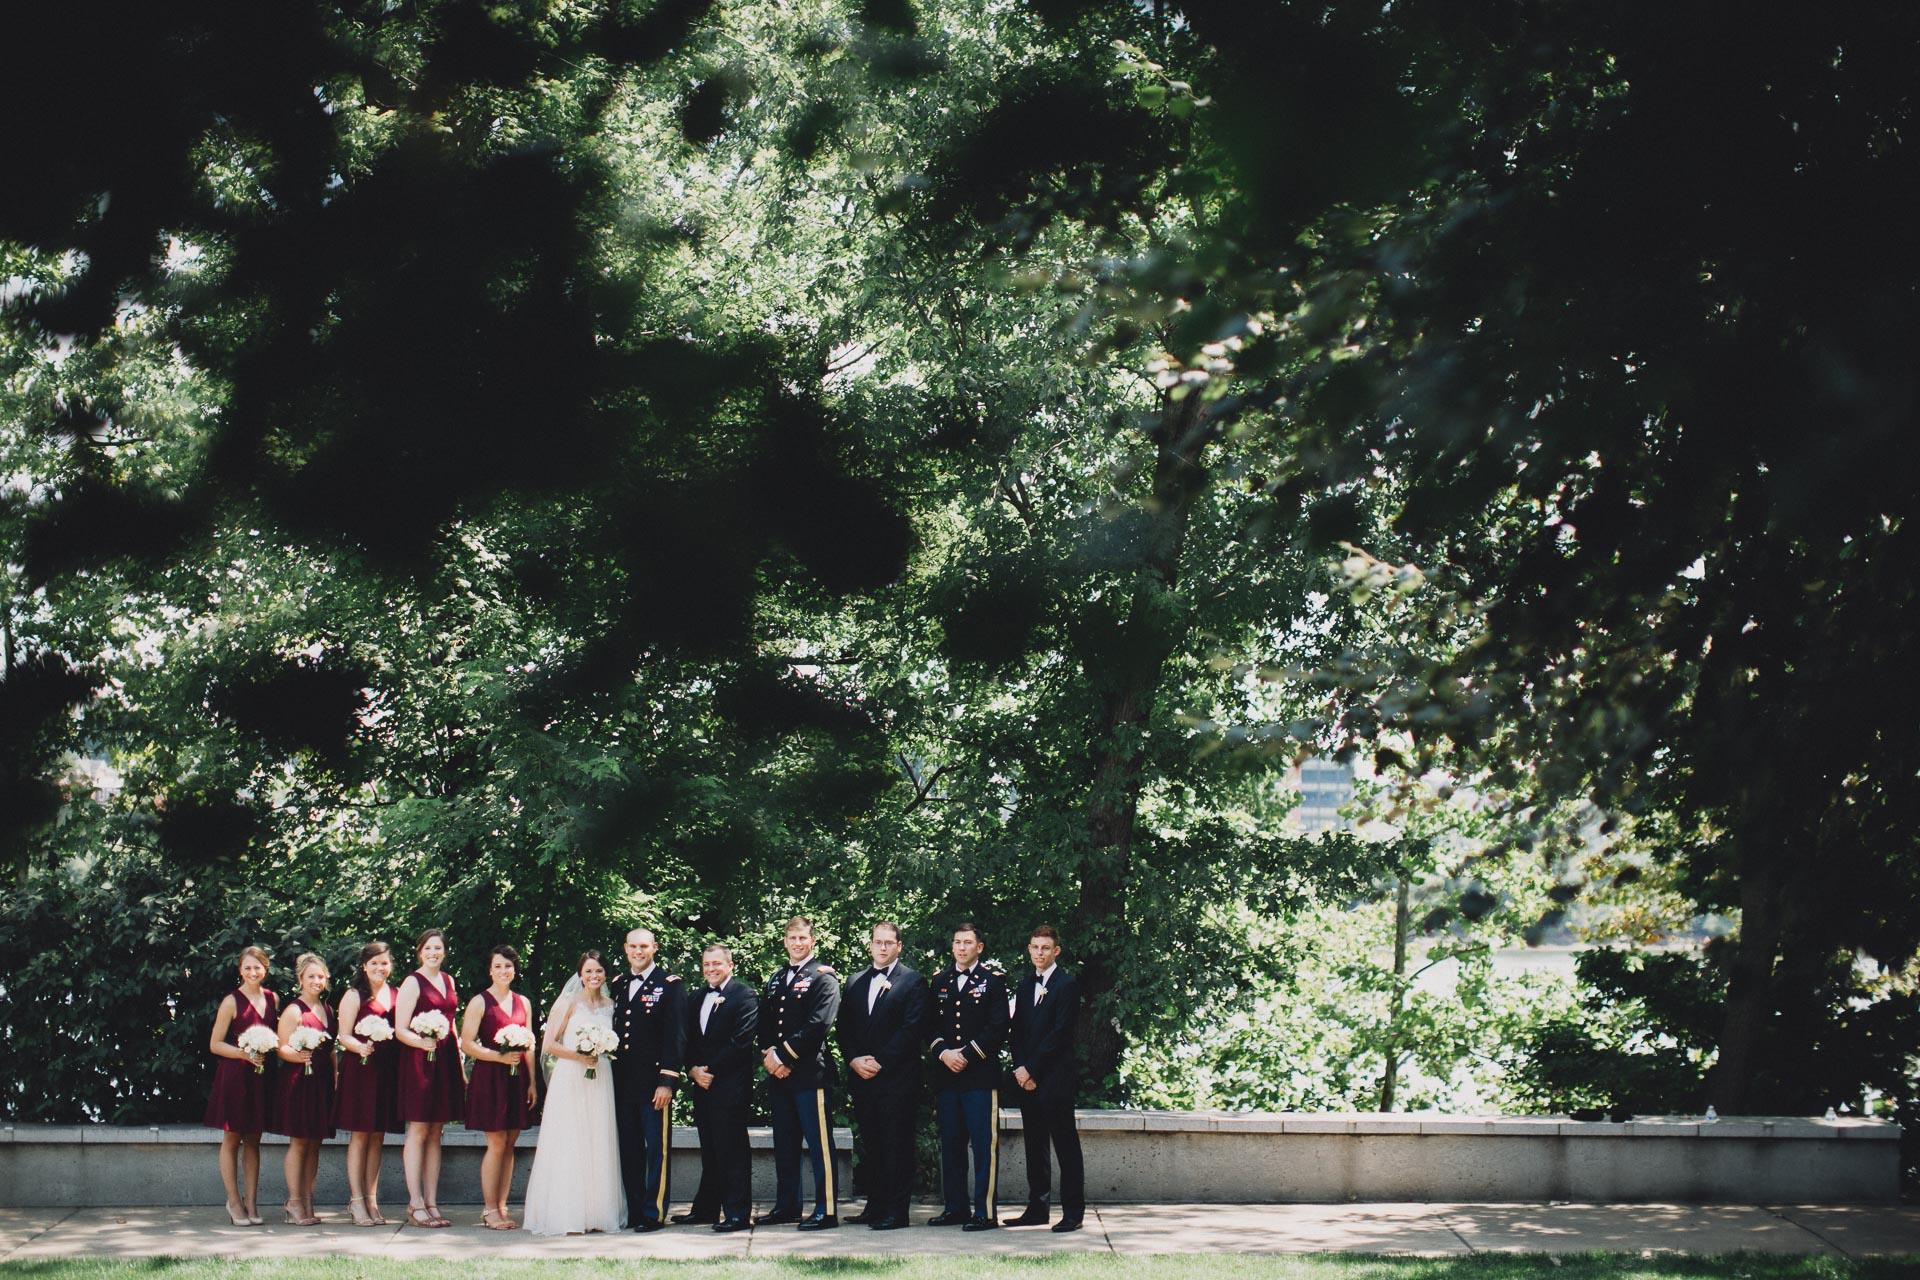 Emily-Eddie-Cincinnati-Rennaissance-Hotel-Wedding-041@2x.jpg